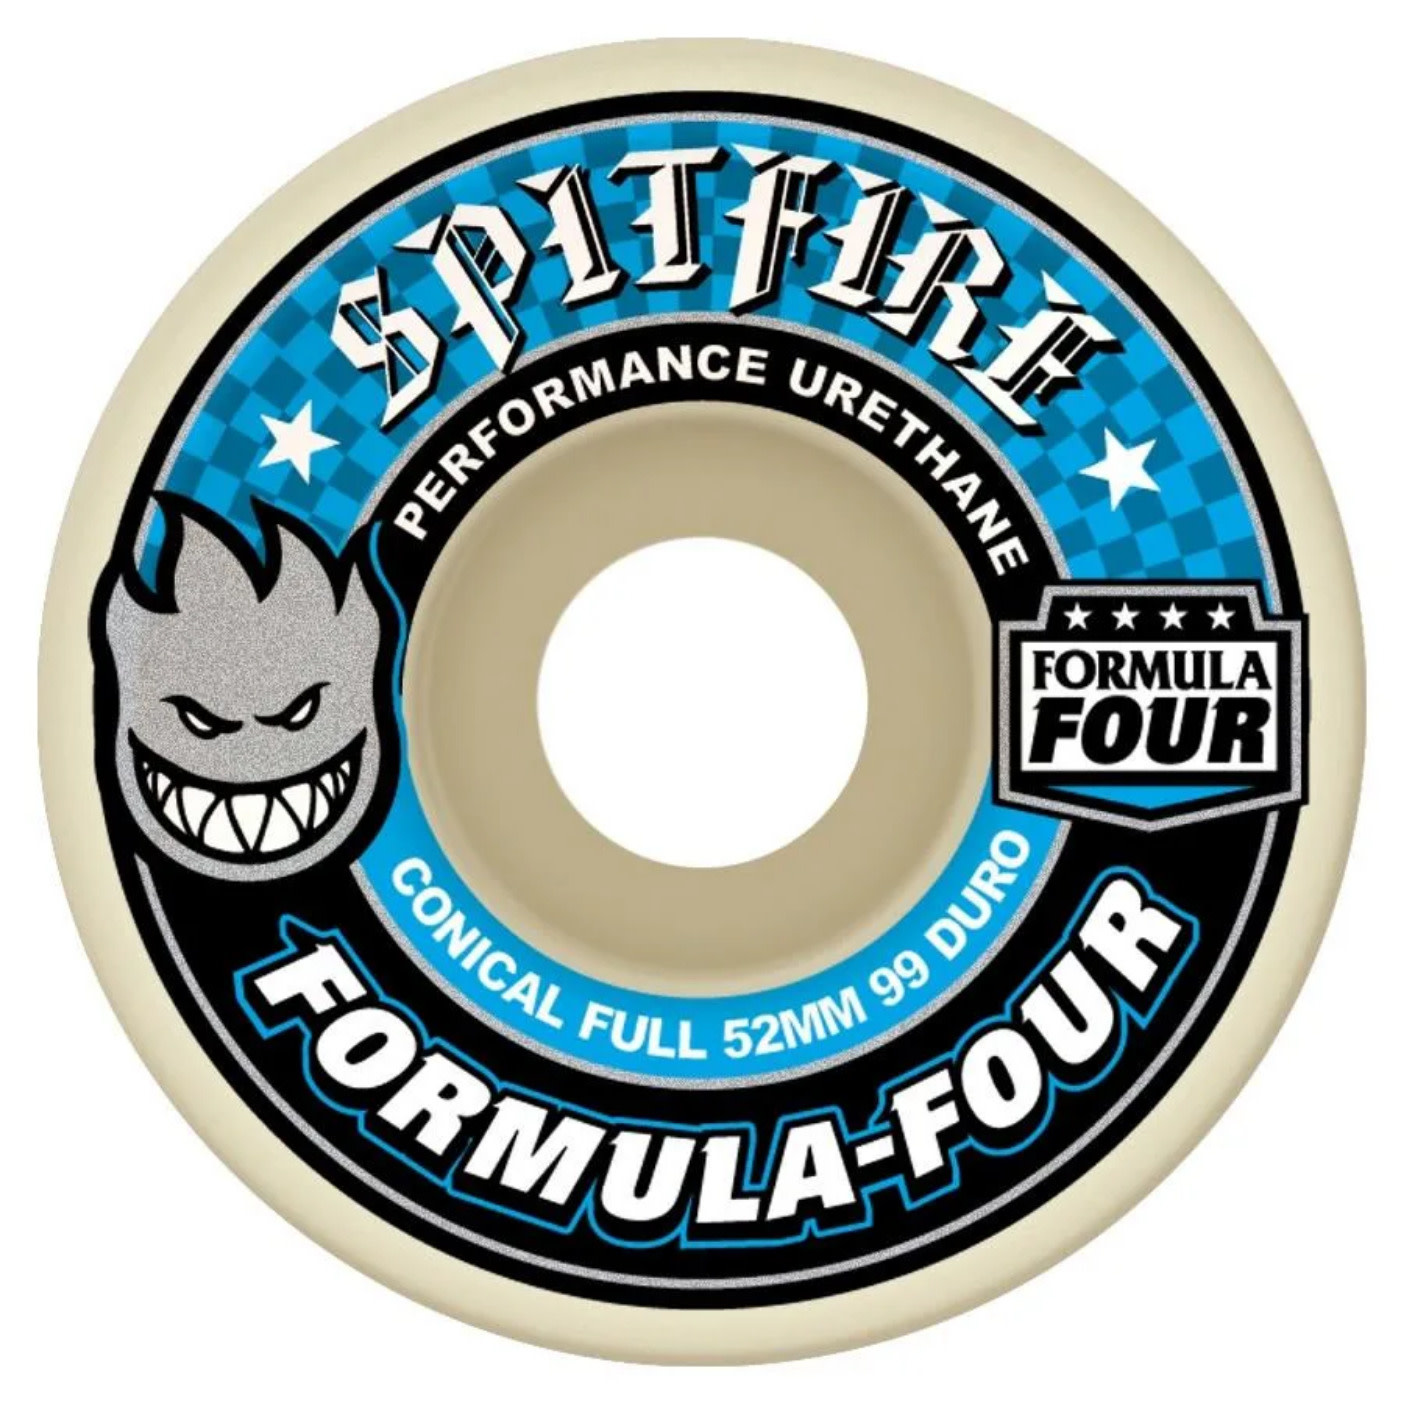 Spitfire Wheels Spitfire F4 99d Conical Full 52mm